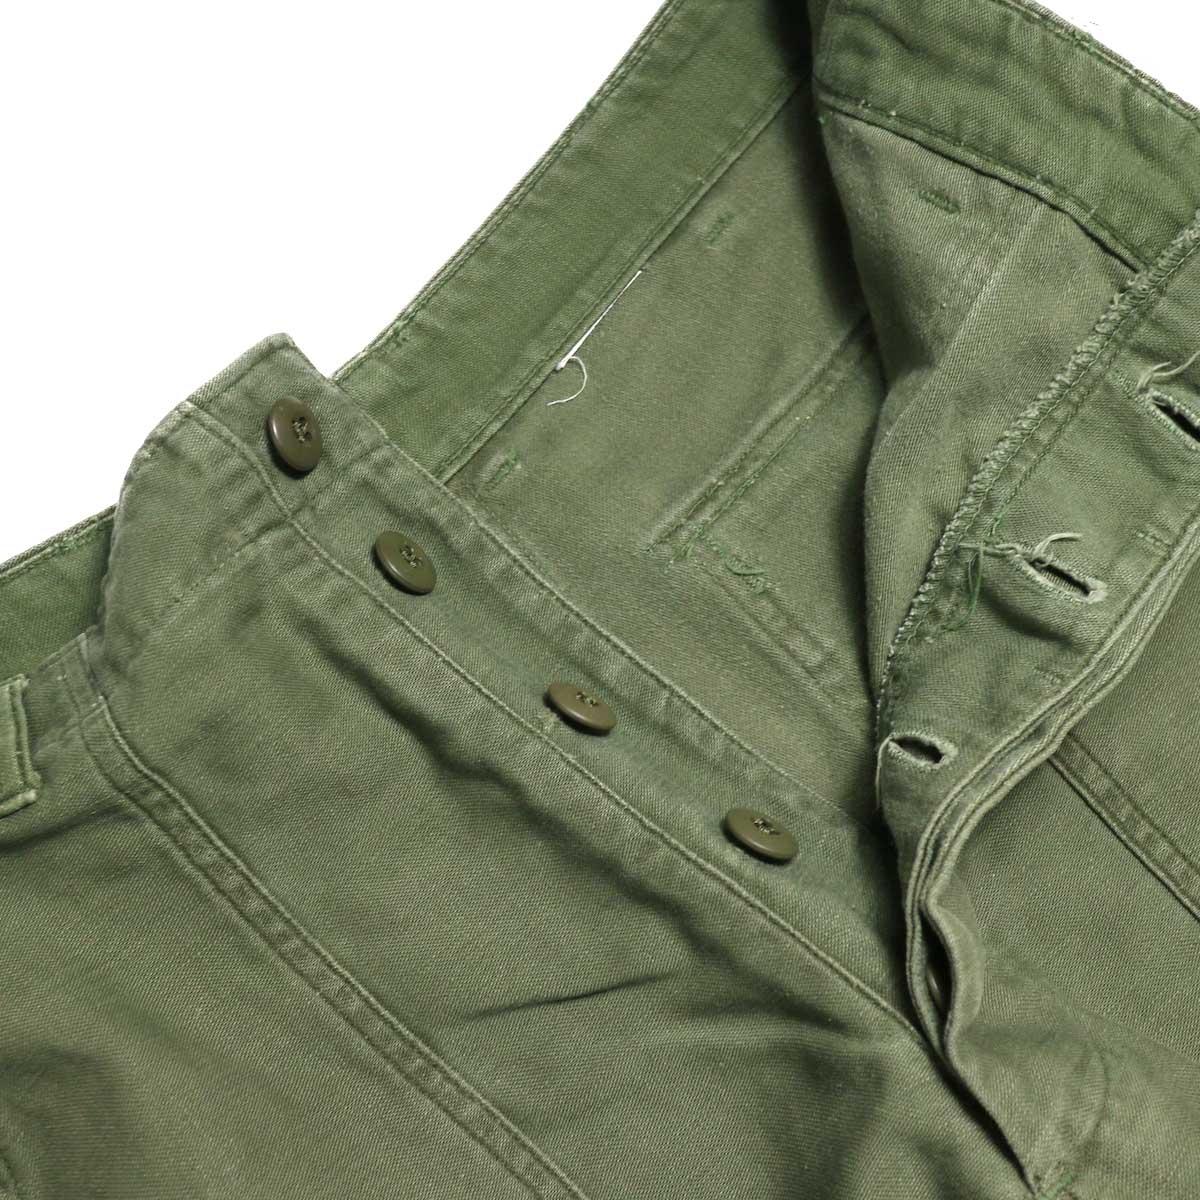 BONUM / Military FAT Pants (Btype) ボタンフライ